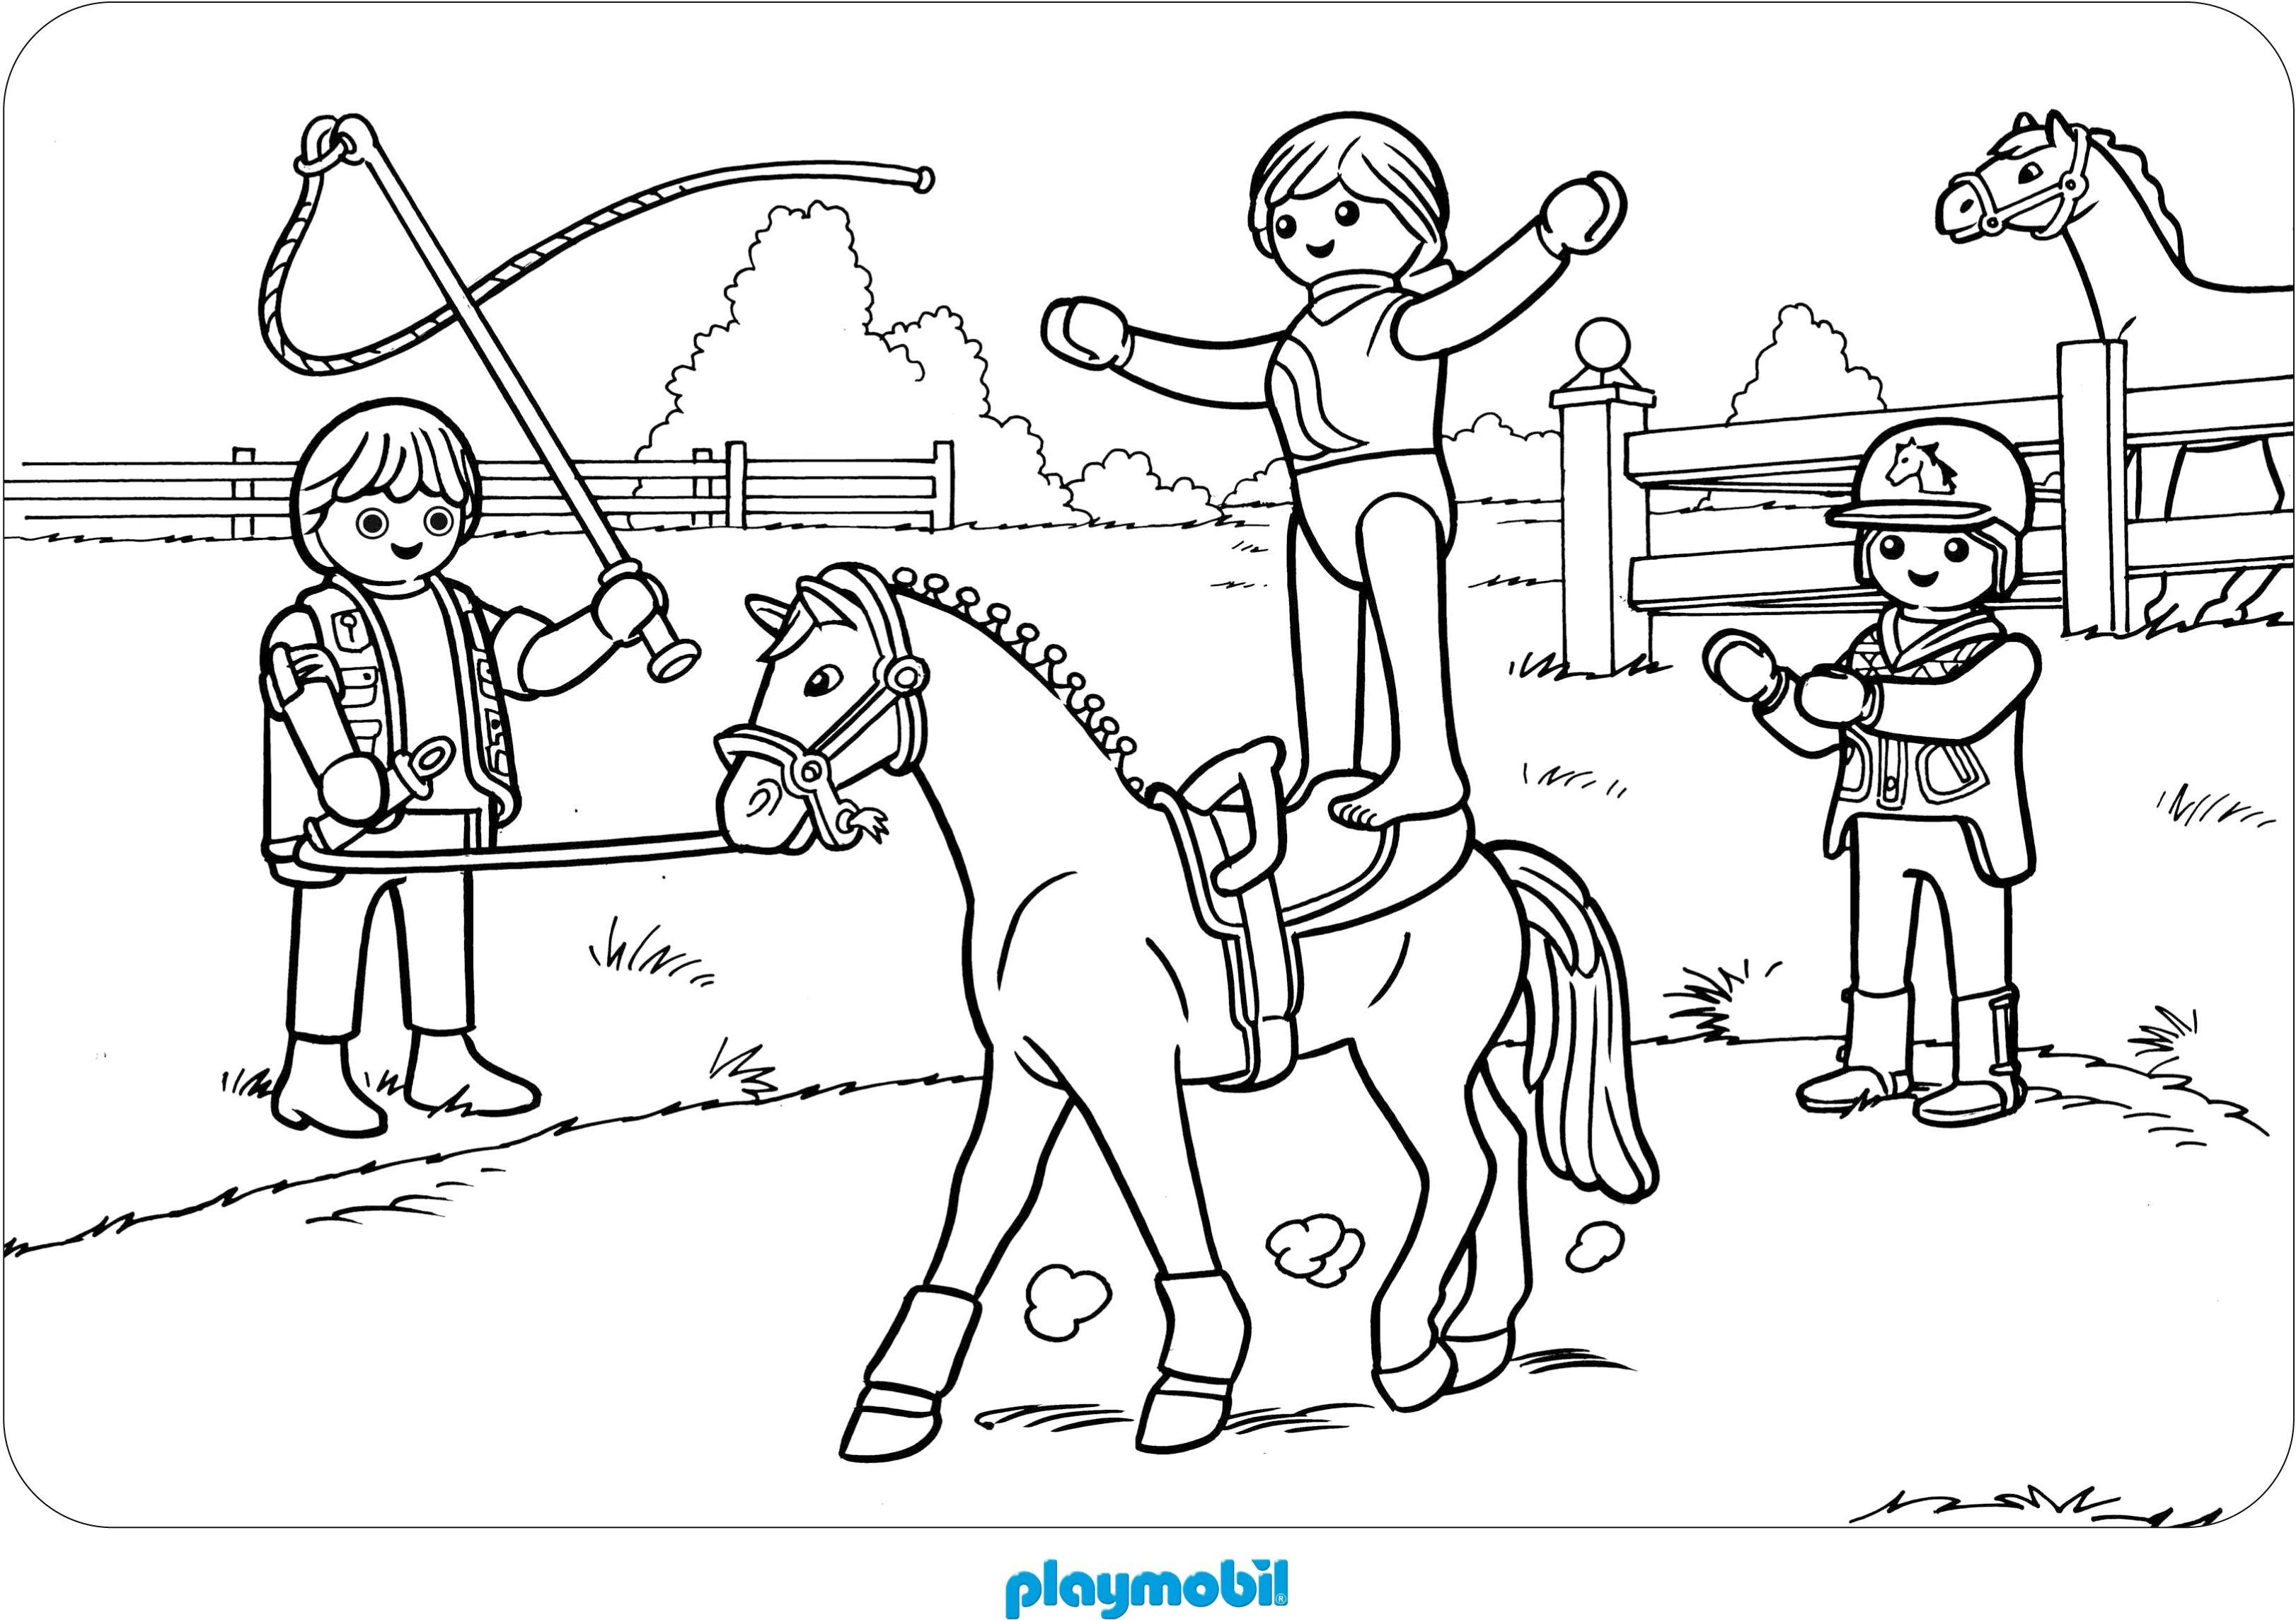 Playmobil Action Ausmalbilder : Playmobil Ausmalbilder Pferde Lego Ausmalbilder Pinterest